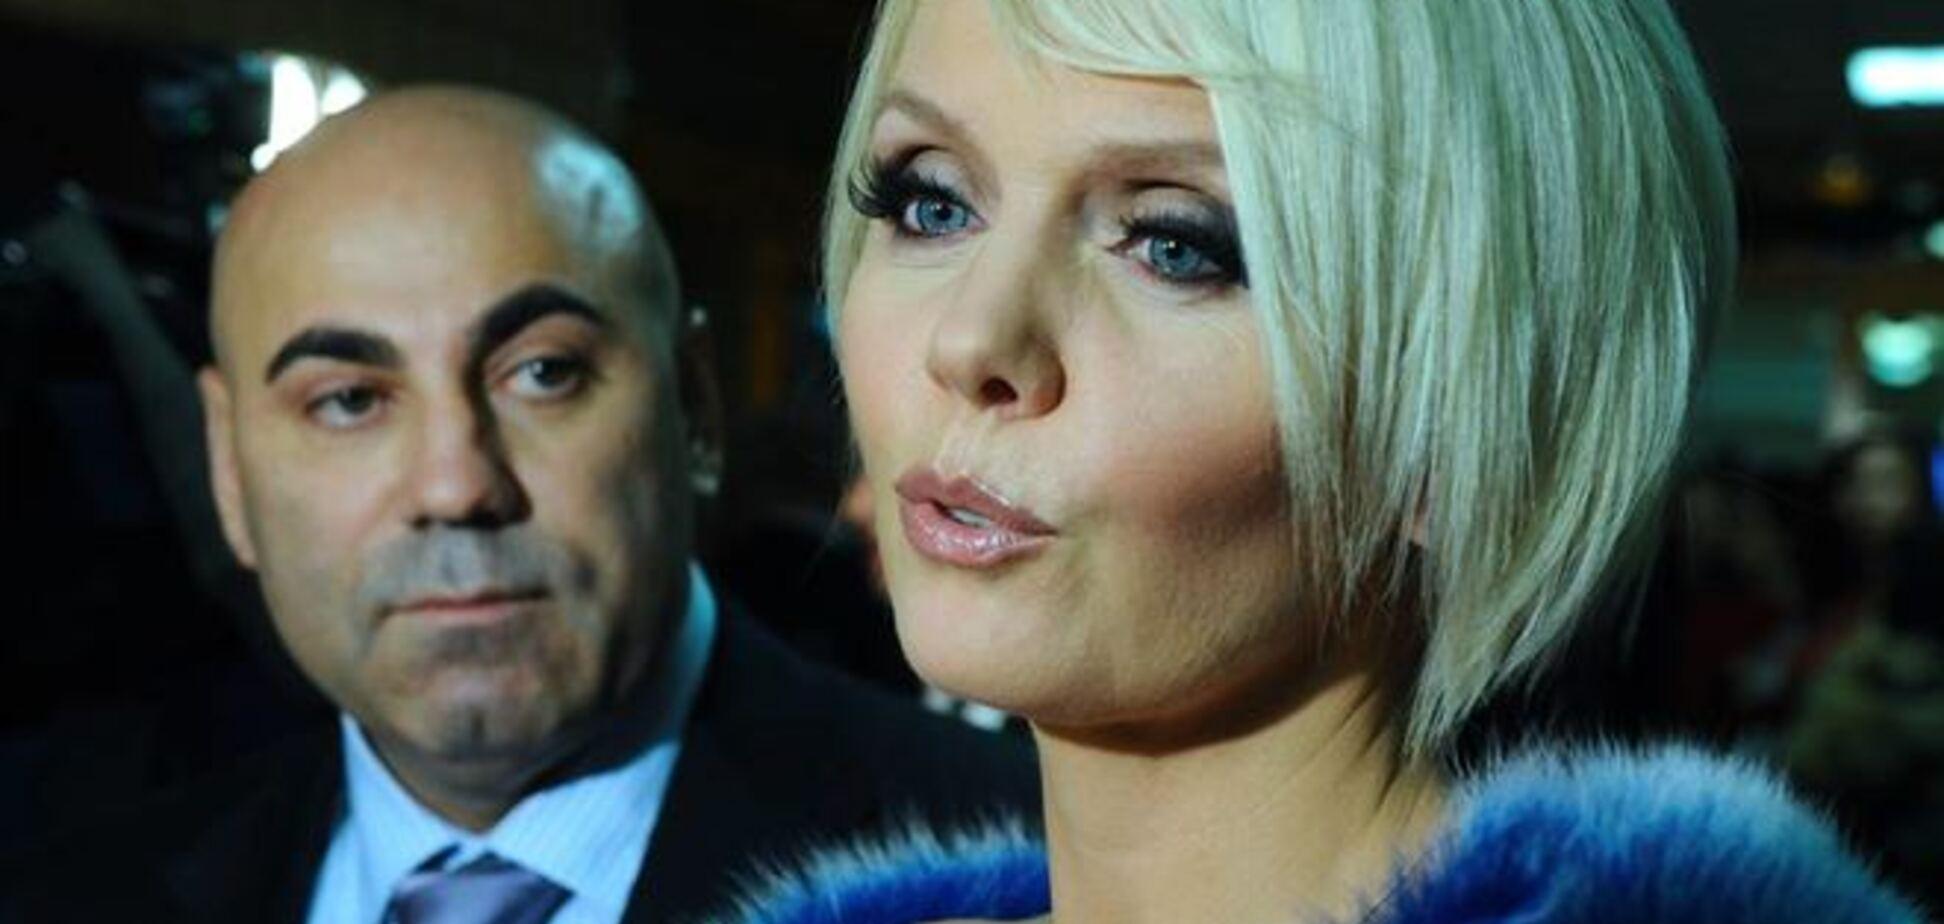 Битва титанов: Валерия и Волочкова натравили друг на друга адвокатов